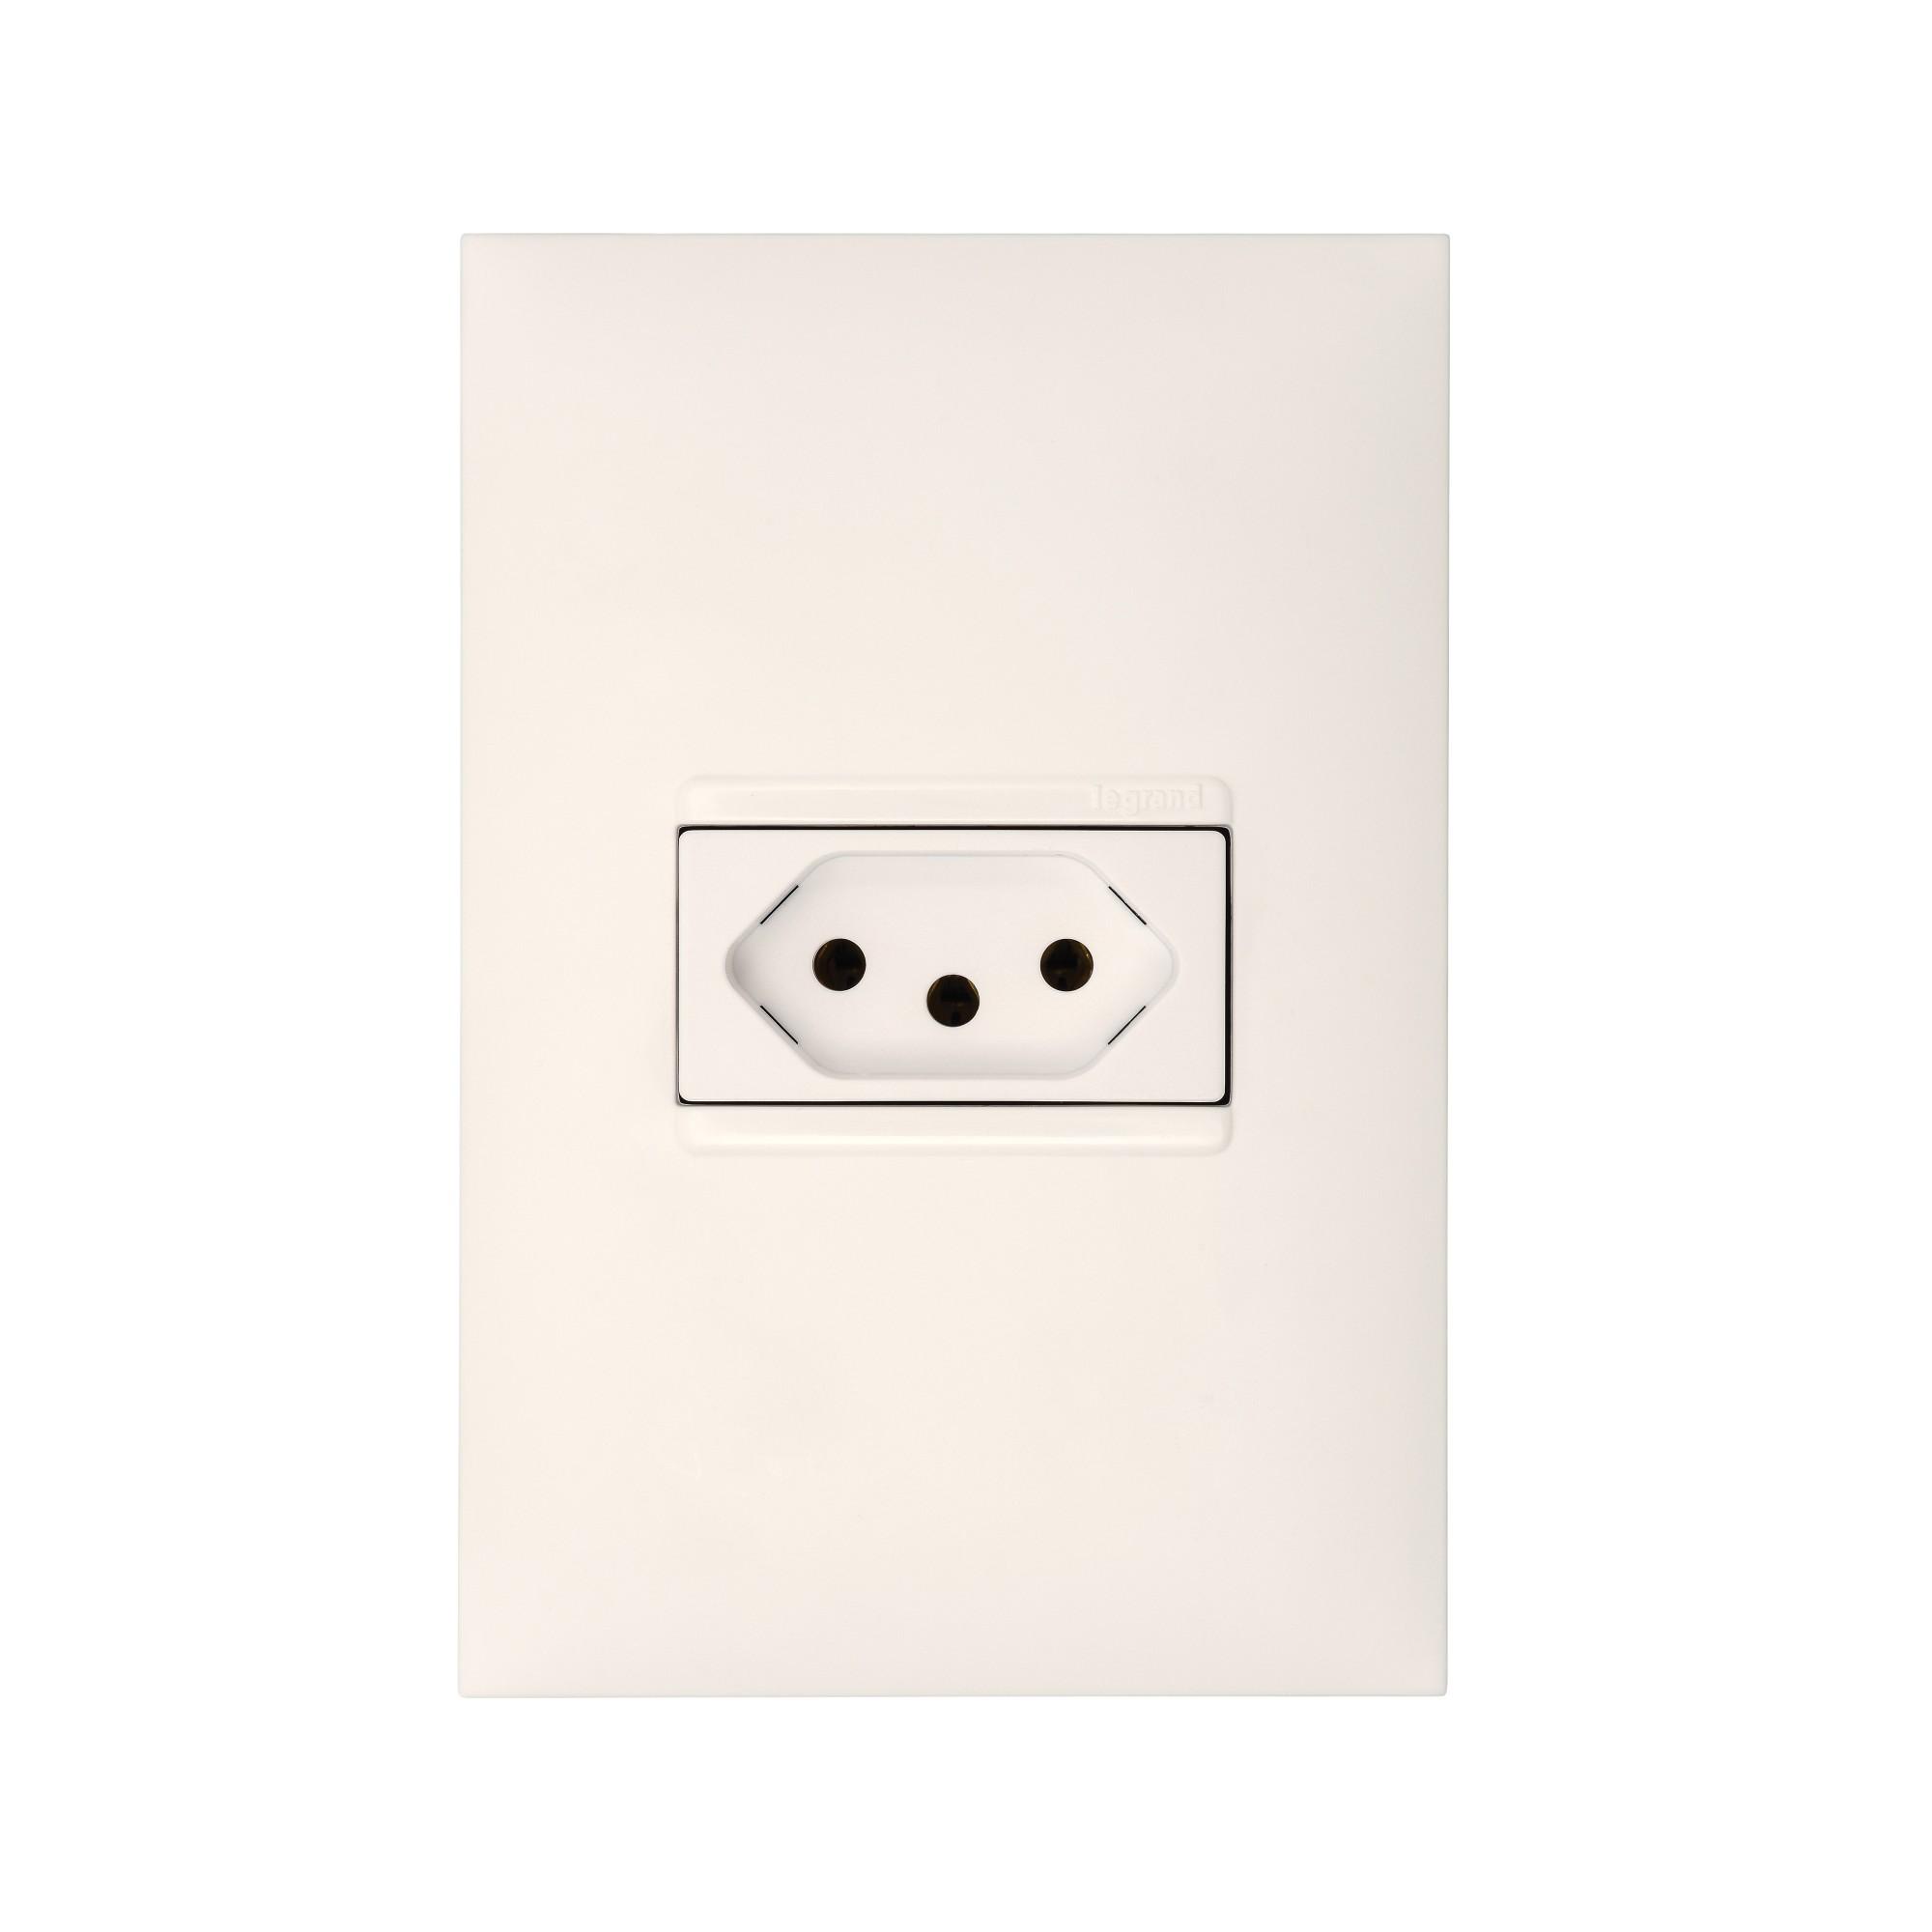 Conjunto de Tomada de Energia 1 Modulo 2P T 10A Branco - Pial Plus - Legrand